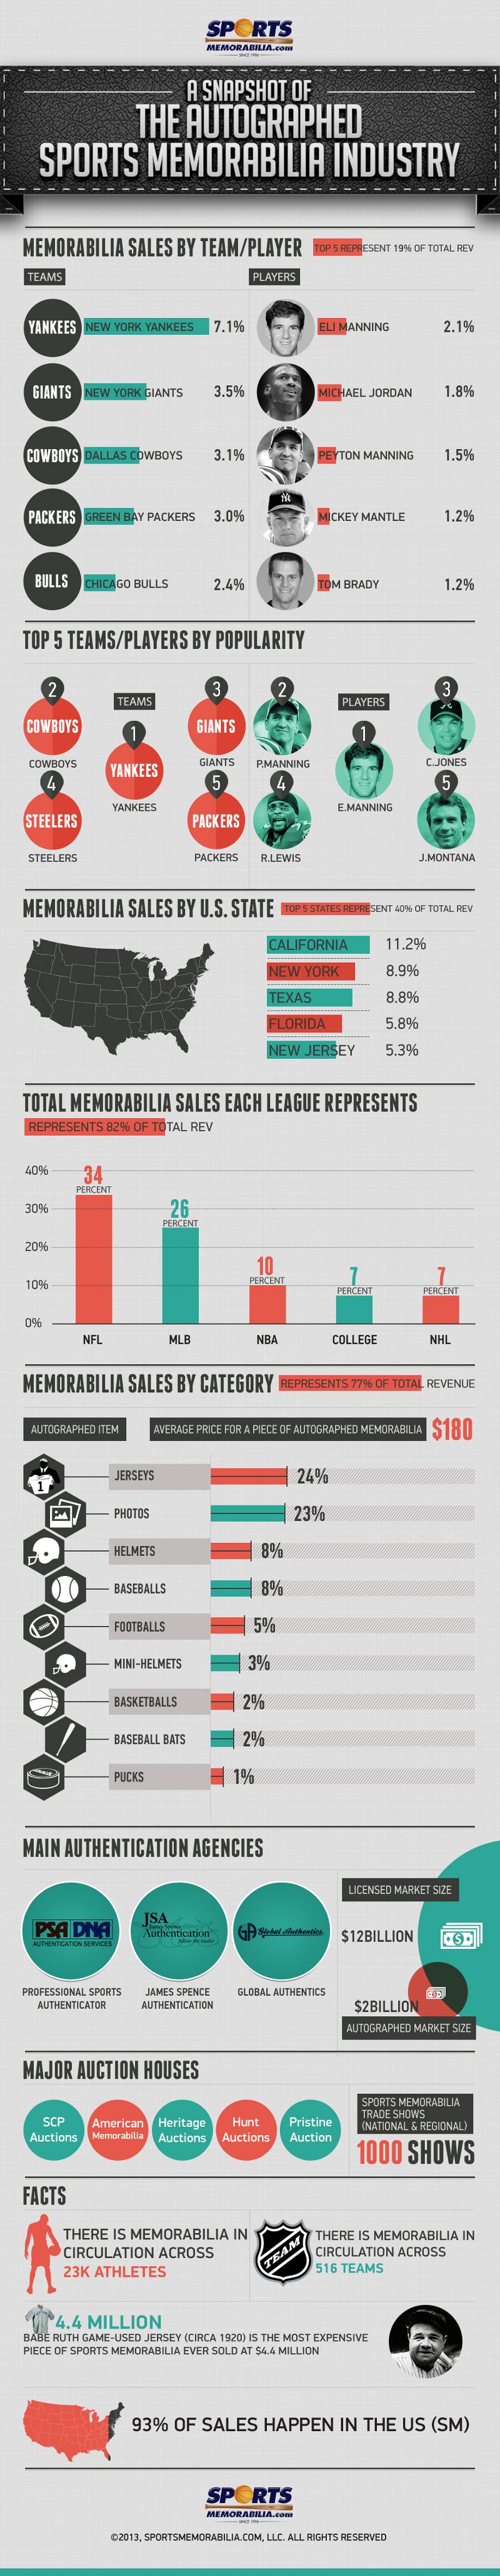 Statistics of Sports Memorabillia Industry